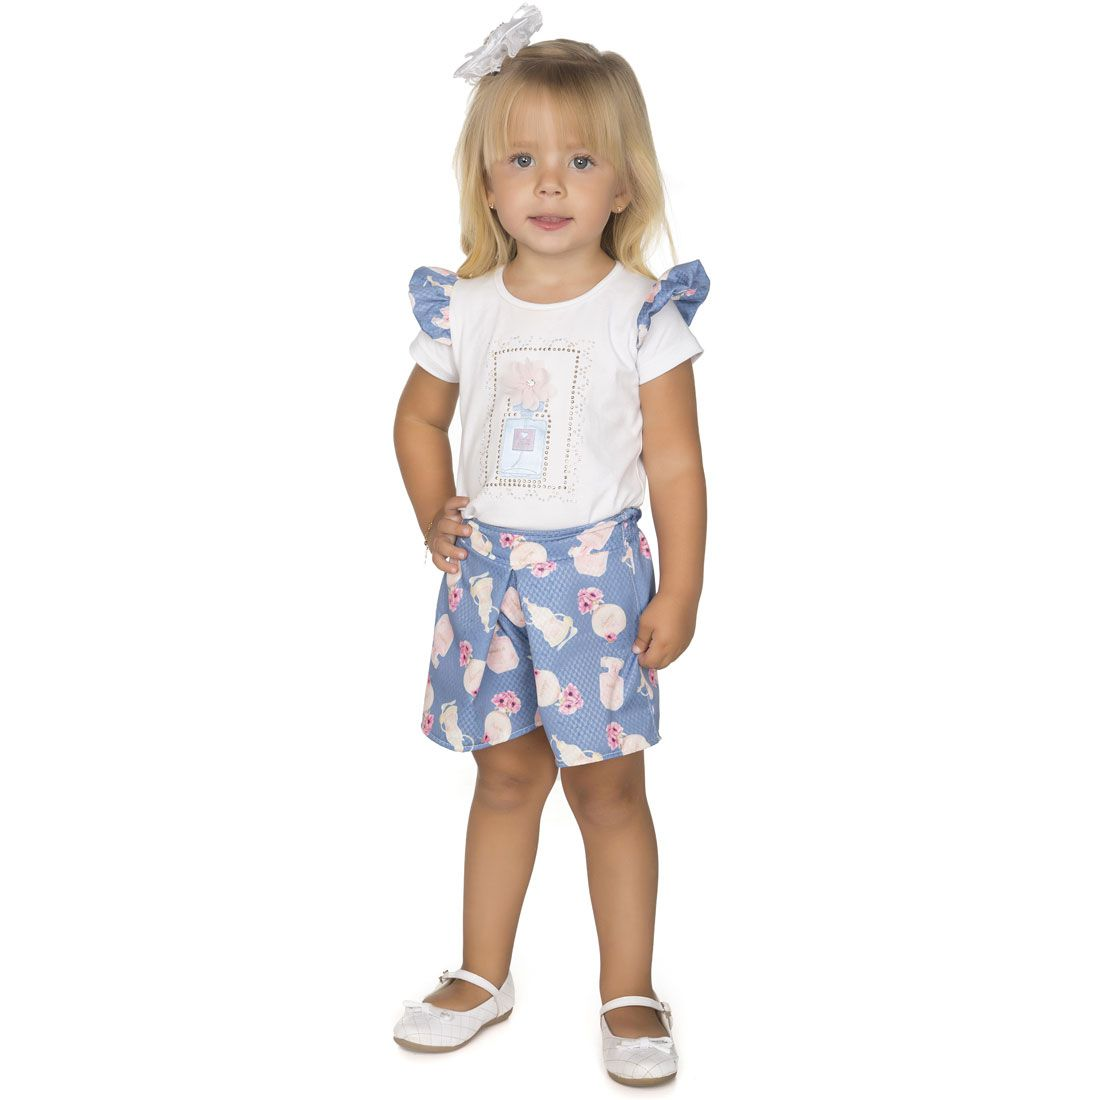 f006e24337 Alekids Conjuntos Menina | Loja Infantil Online - Promoções ...